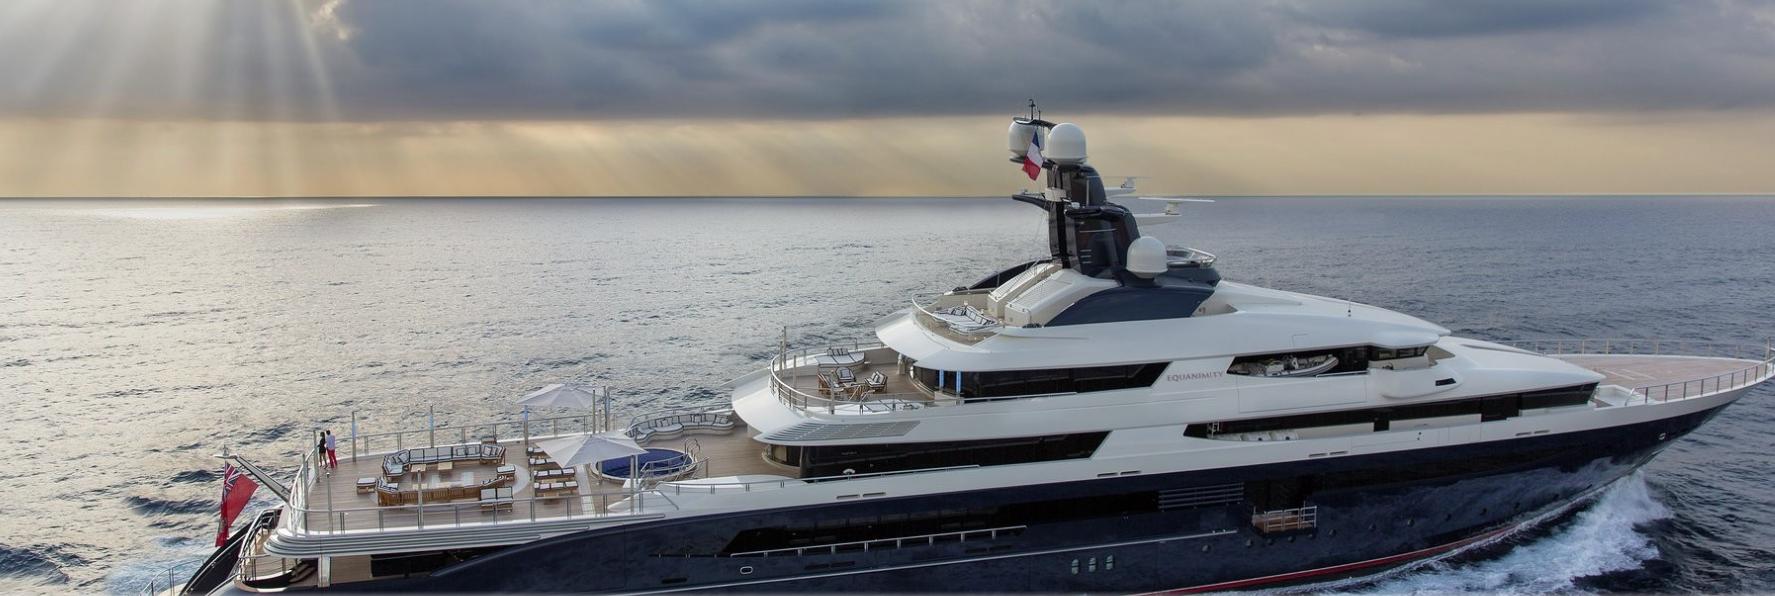 Randall Burg Concierge Yacht Broker Buy and Sell Christensen